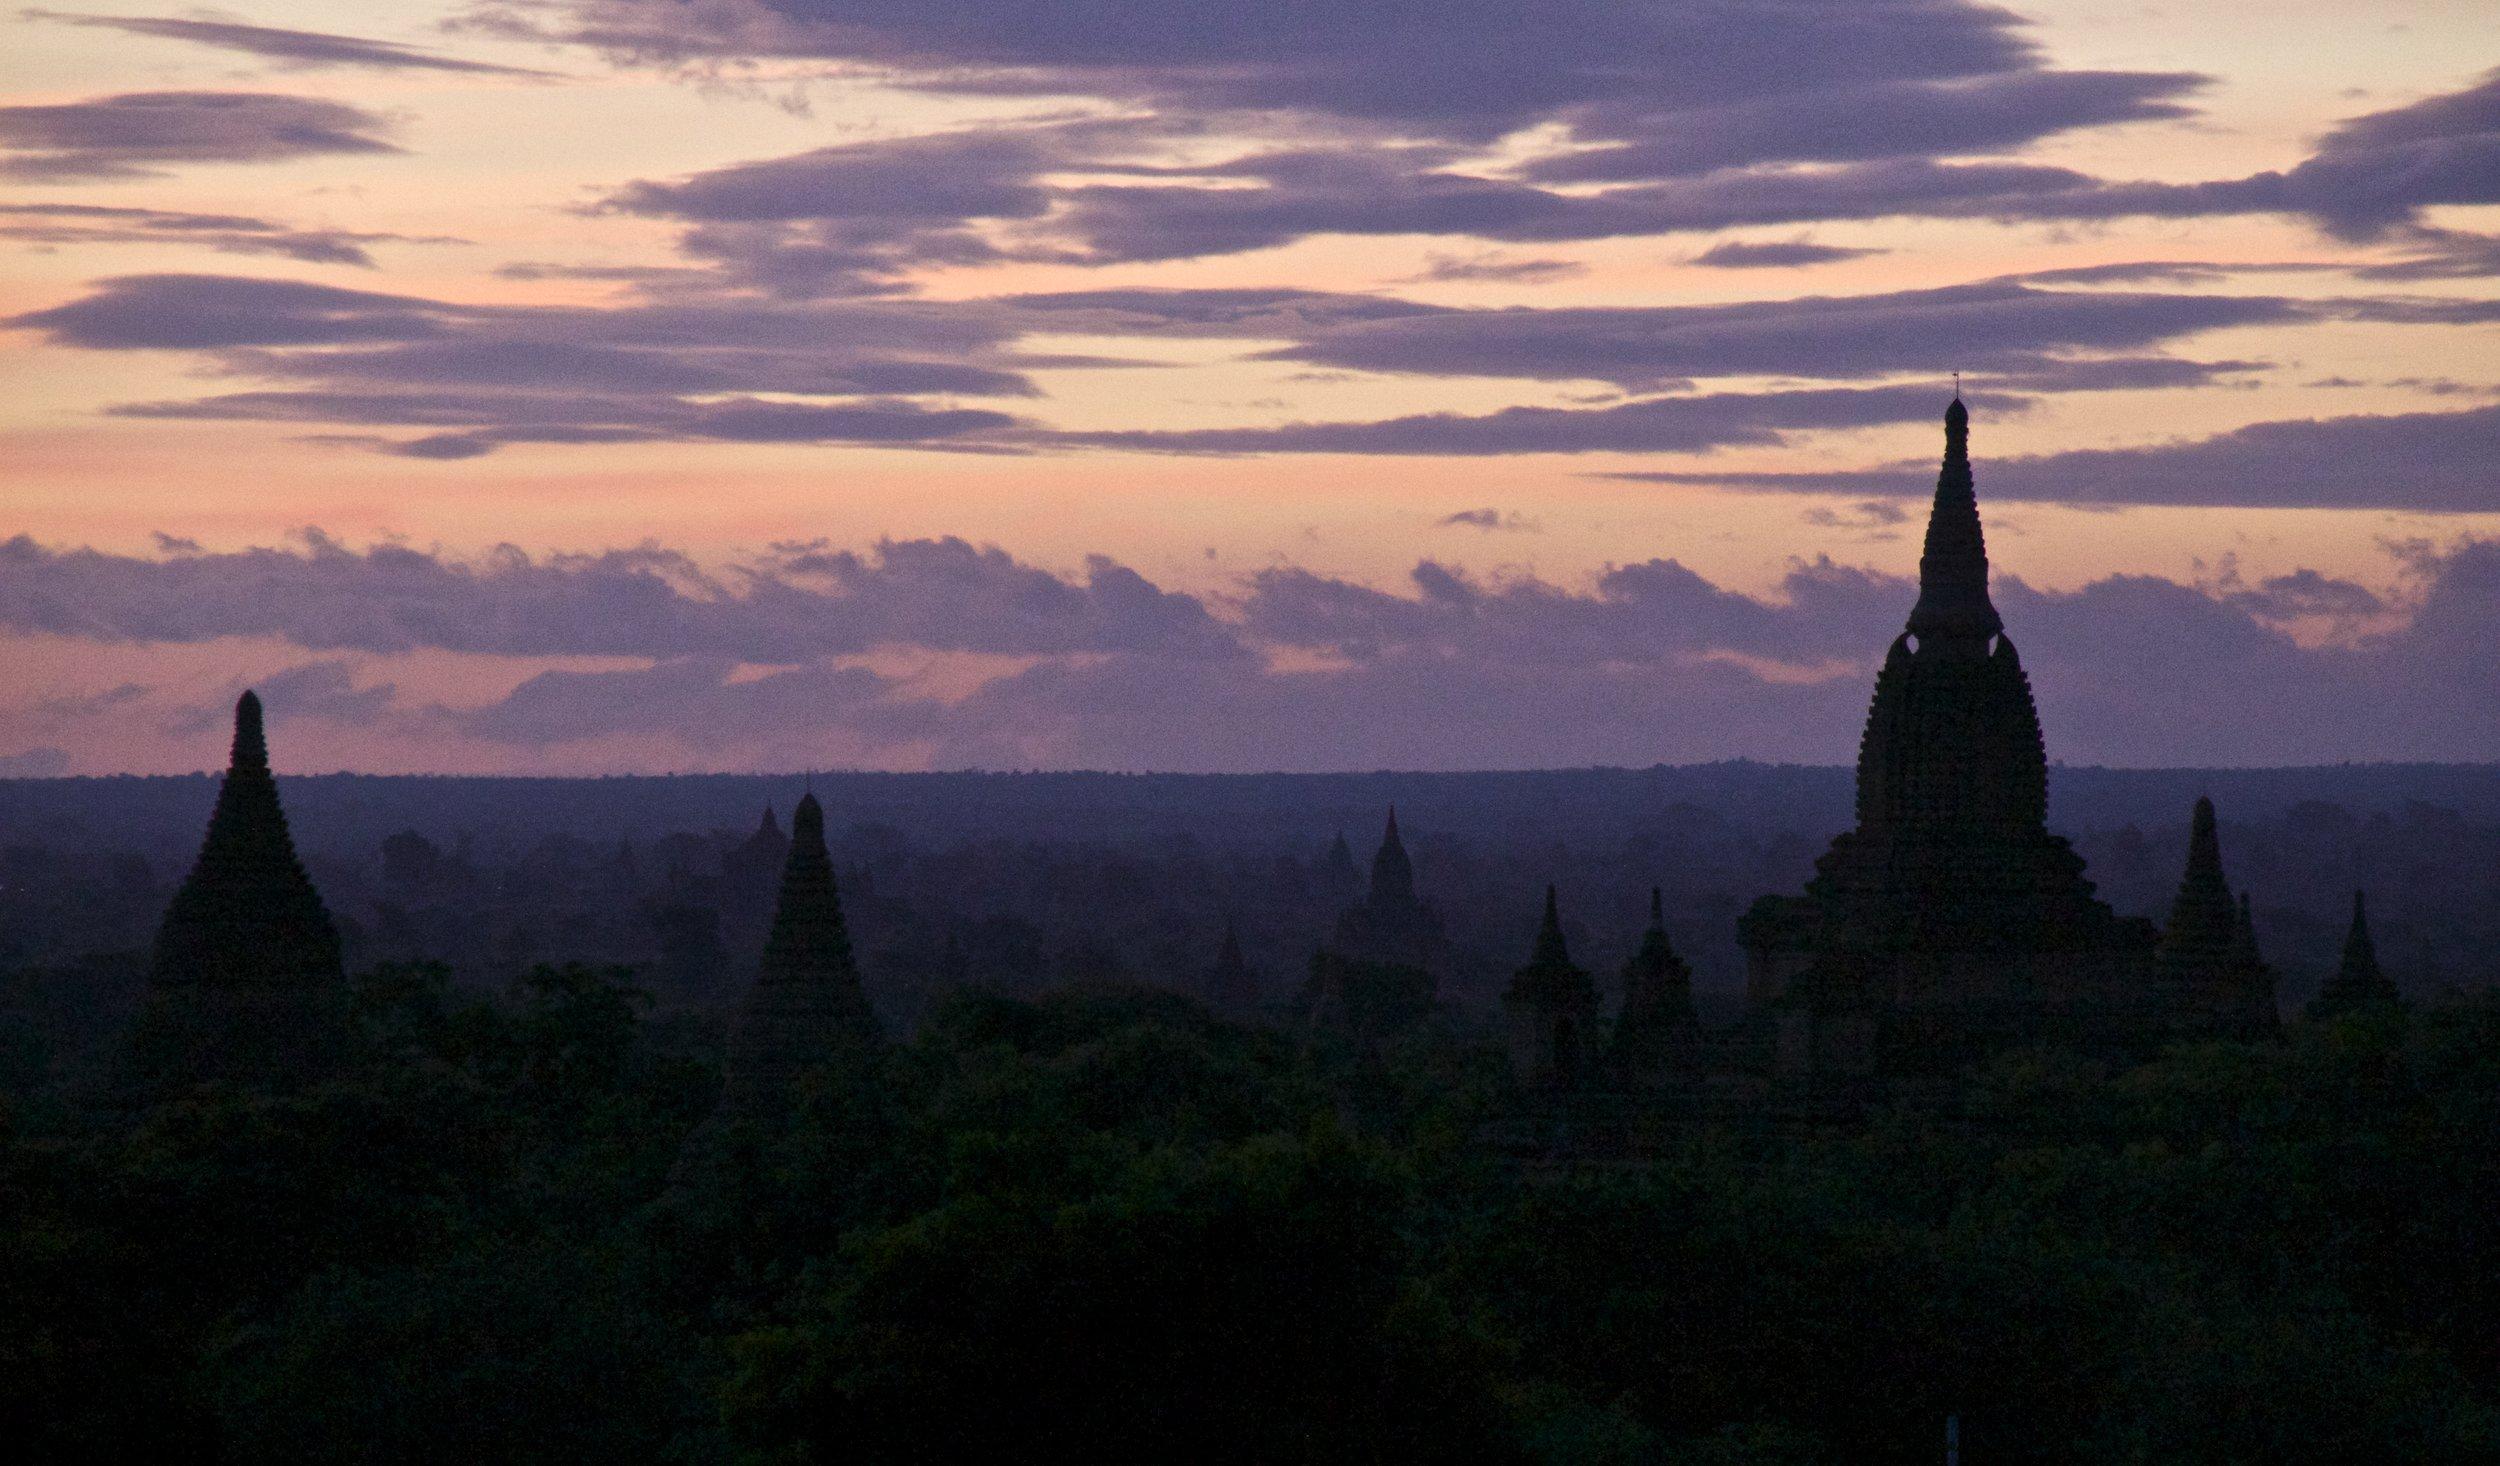 bagan burma myanmar temples sunrise 8.jpg